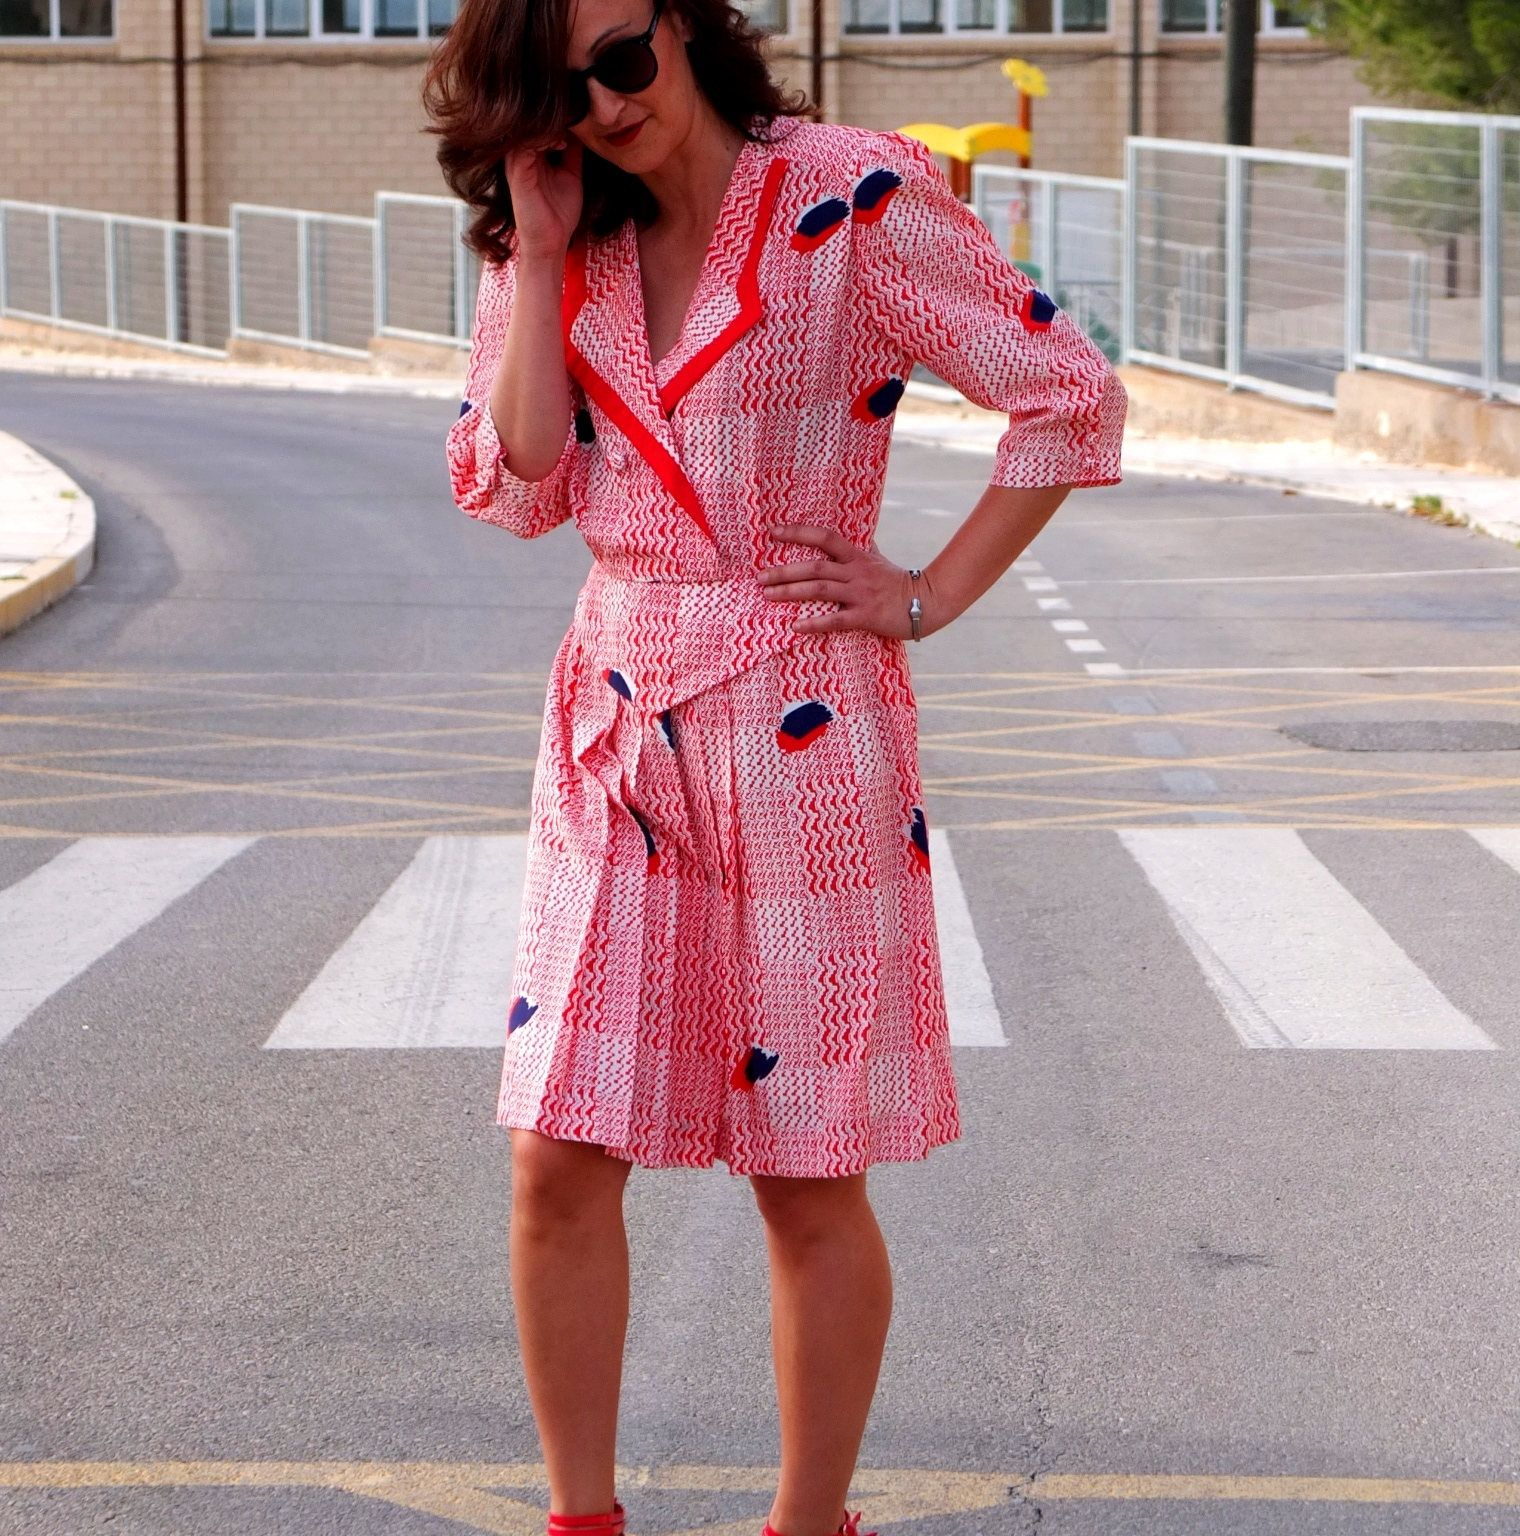 80s Red Plaid Secretary Style Vintage Dress